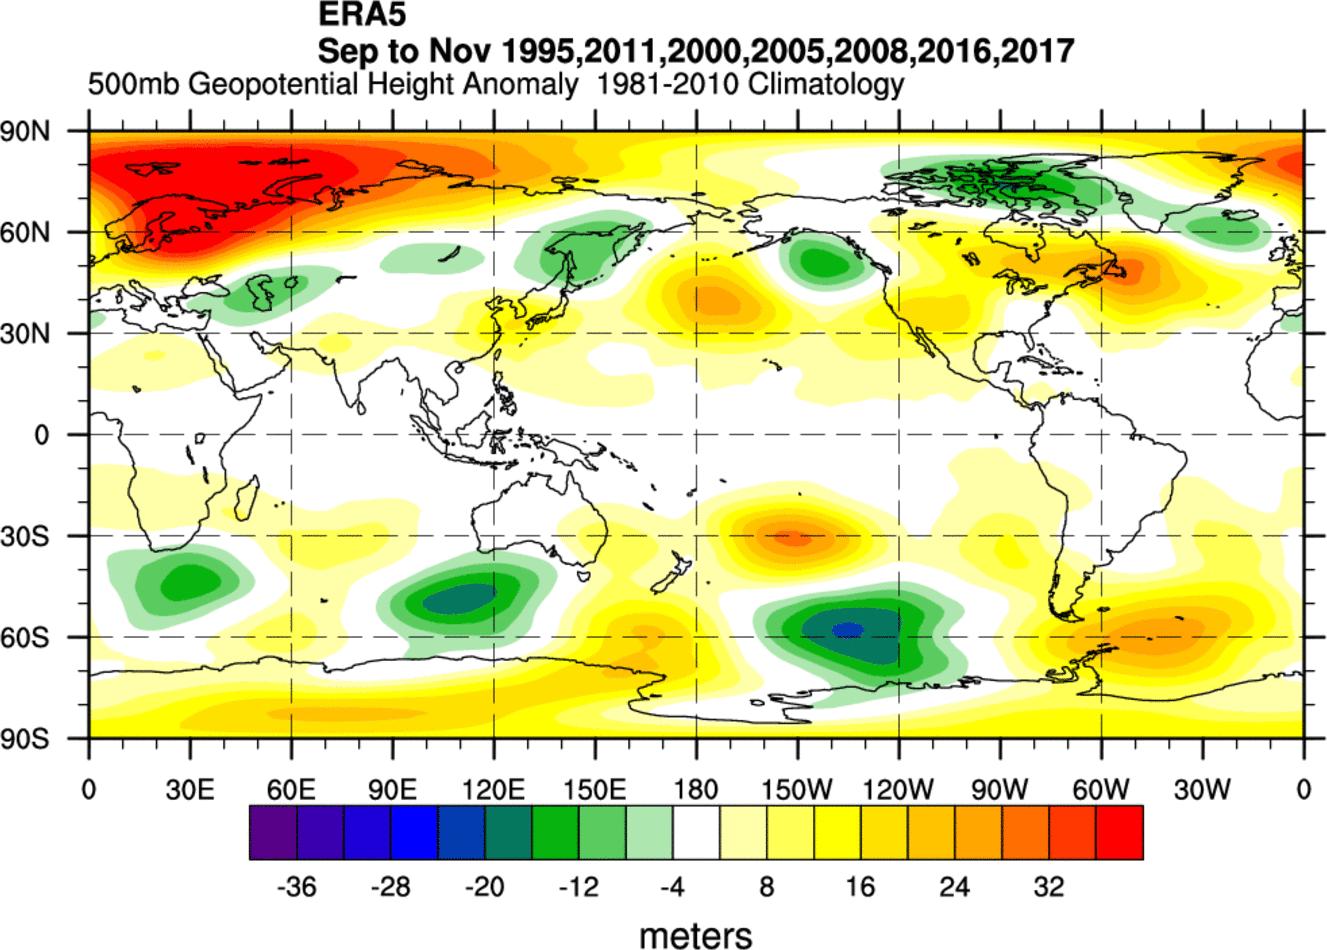 fall-forecast-la-nina-enso-historical-pressure-pattern